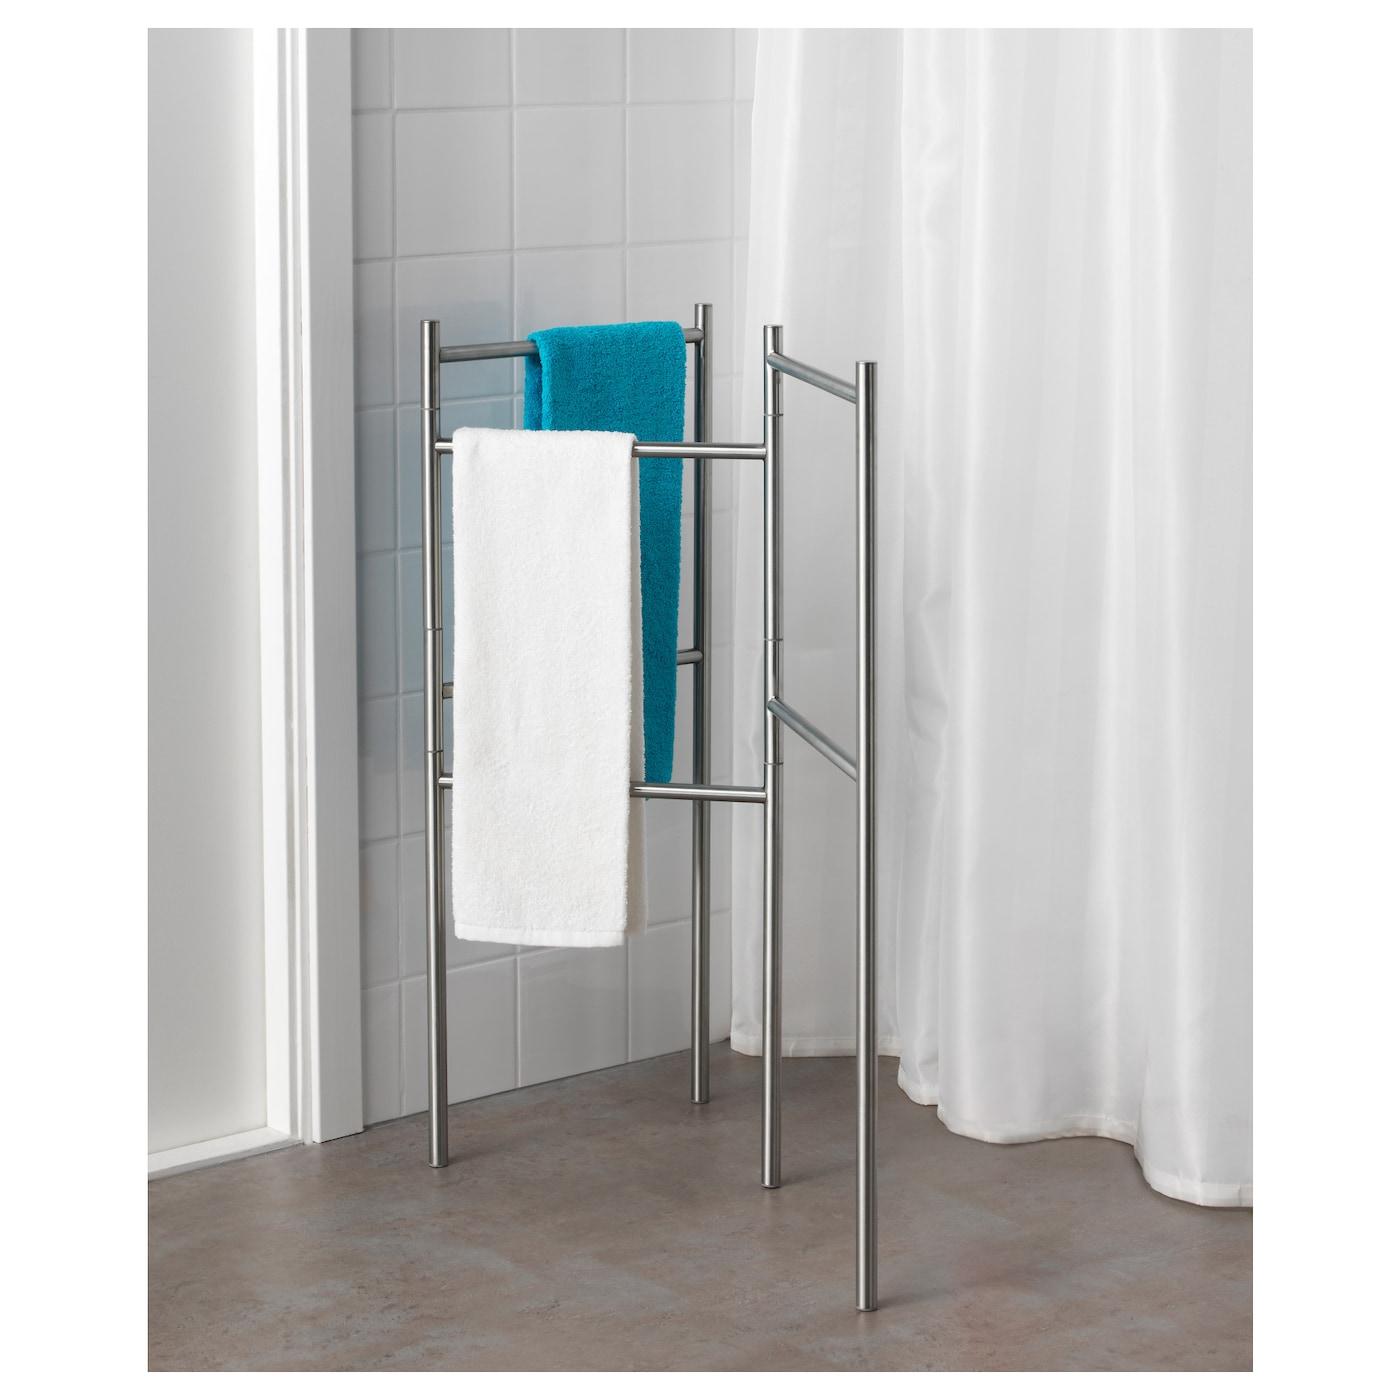 Grundtal portant serviettes acier inoxydable ikea for Porte serviettes ikea grundtal